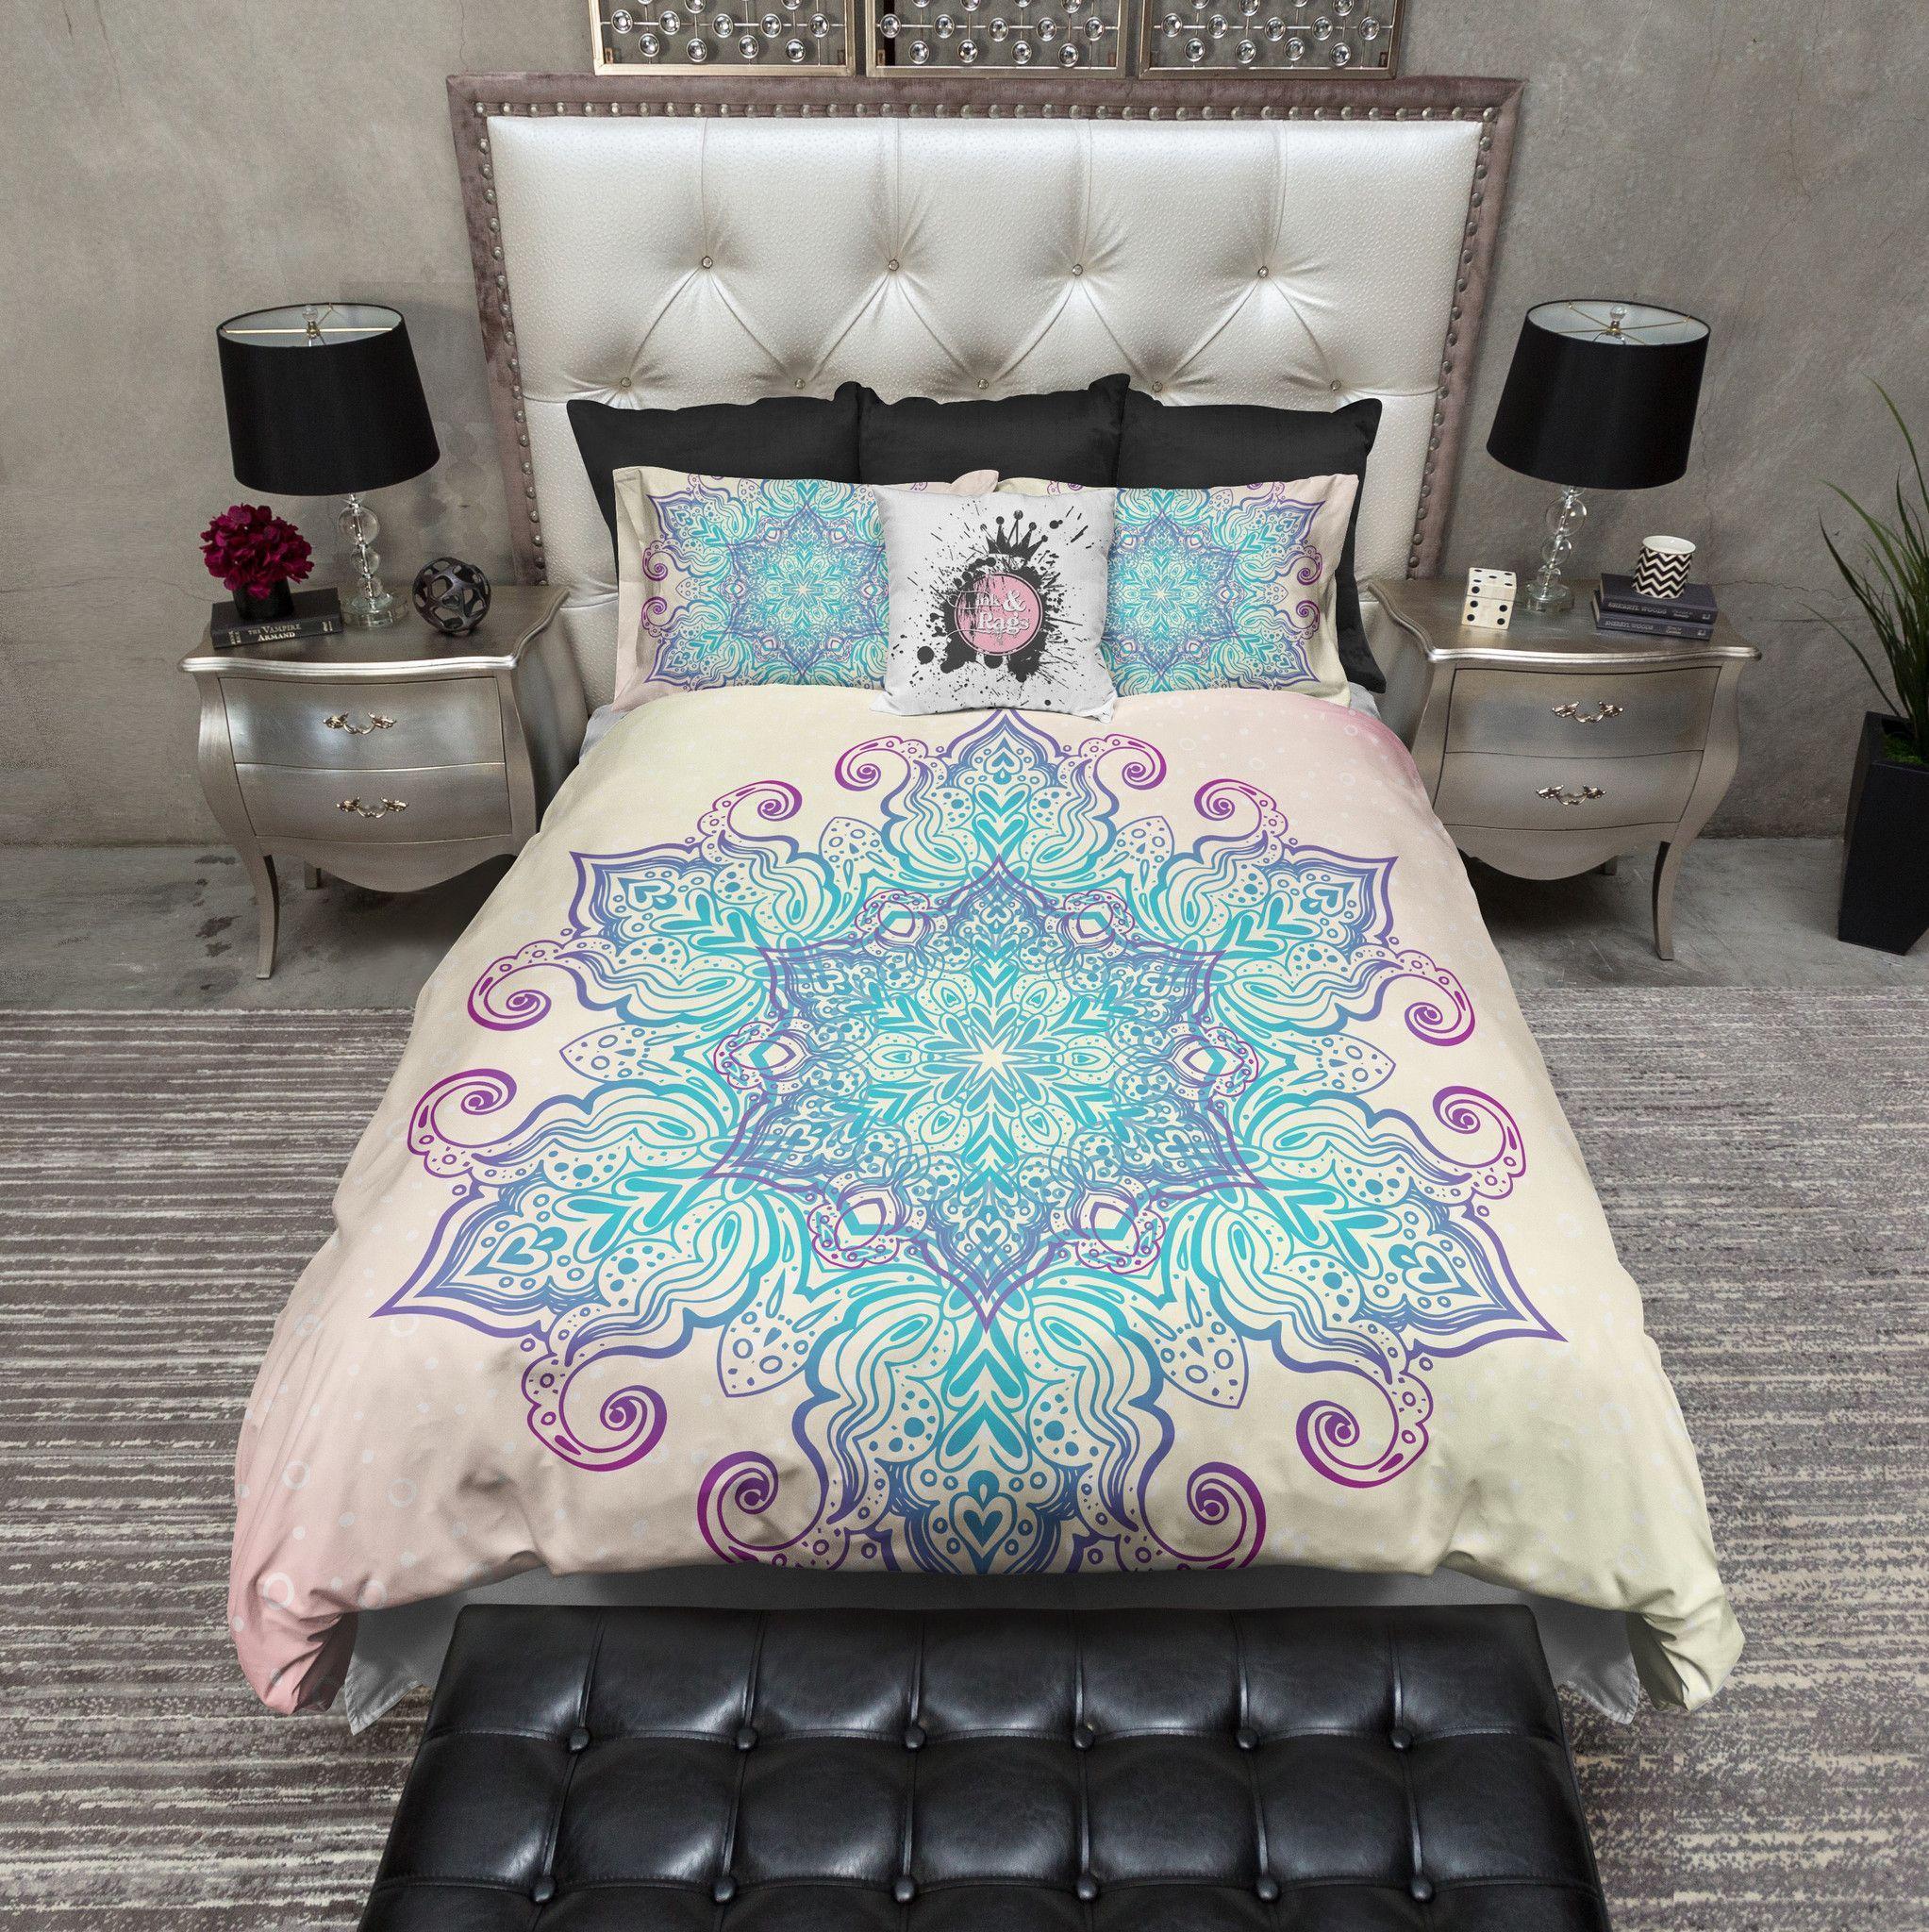 Vs pink bedding sets - Boho Blue And Purple Mandala Duvet Bedding Sets